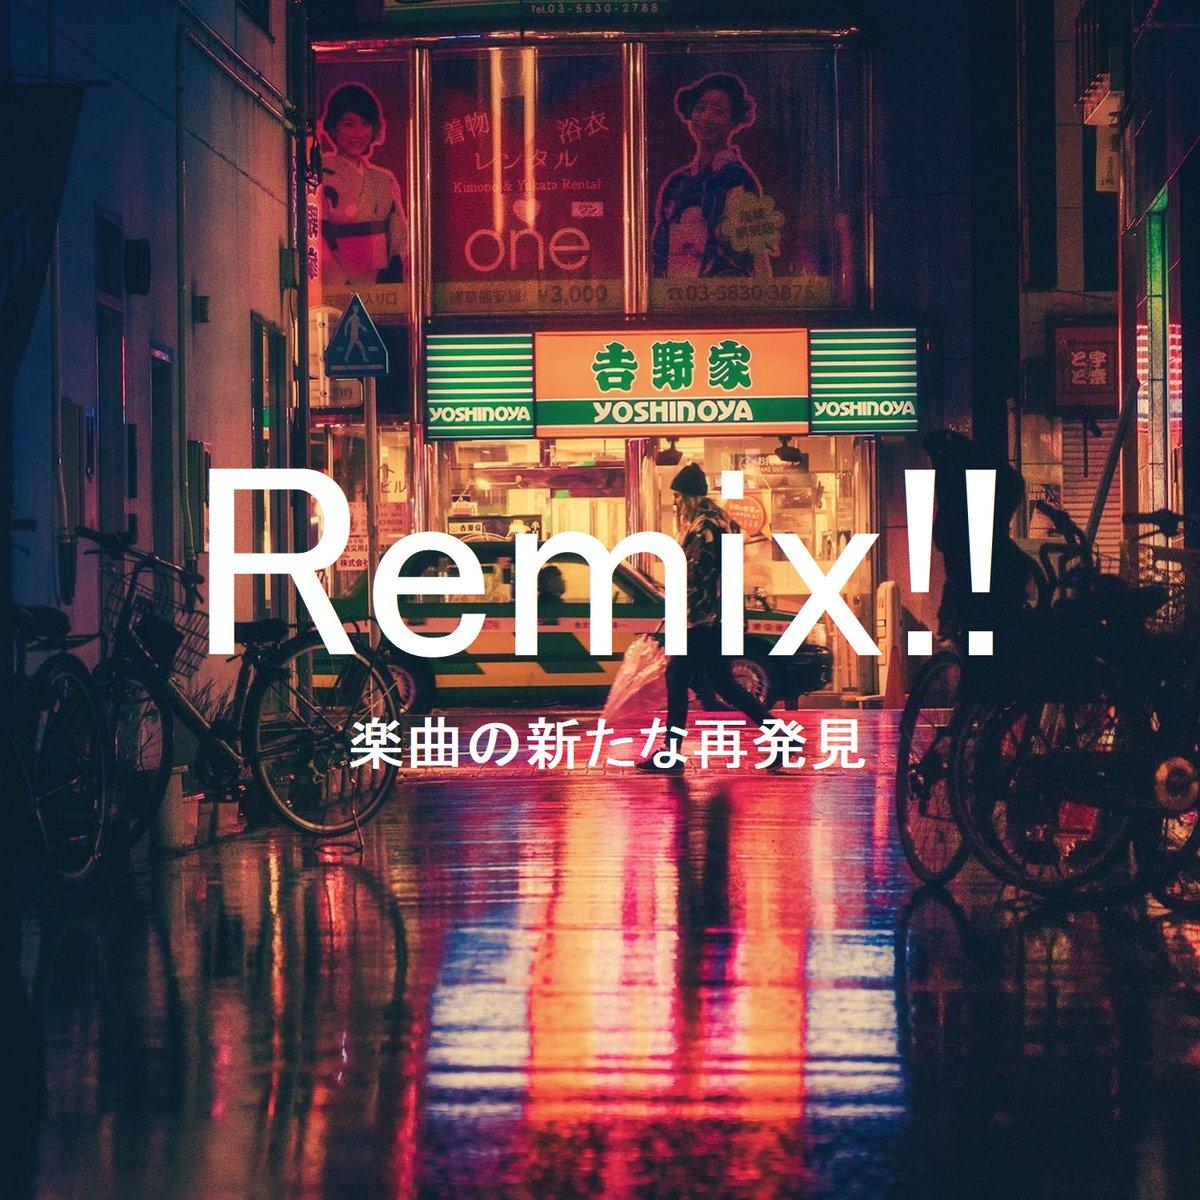 ◤#Spotify J-Remix 4/2◢Japanese Remix Song!!UA / Rei Harakami児玉奈央 / Kan Sano空音 /SHUNLULU, okkaaa/ SKYTOPIAMuKuRo/FKDBUGS, maco marets /TSUBAMESubstantial/ NujabesDJ Mitsu The Beats /DJ KiyoNomak, Pismo/Shin-Skiハレトキドキ/ Kabanagu